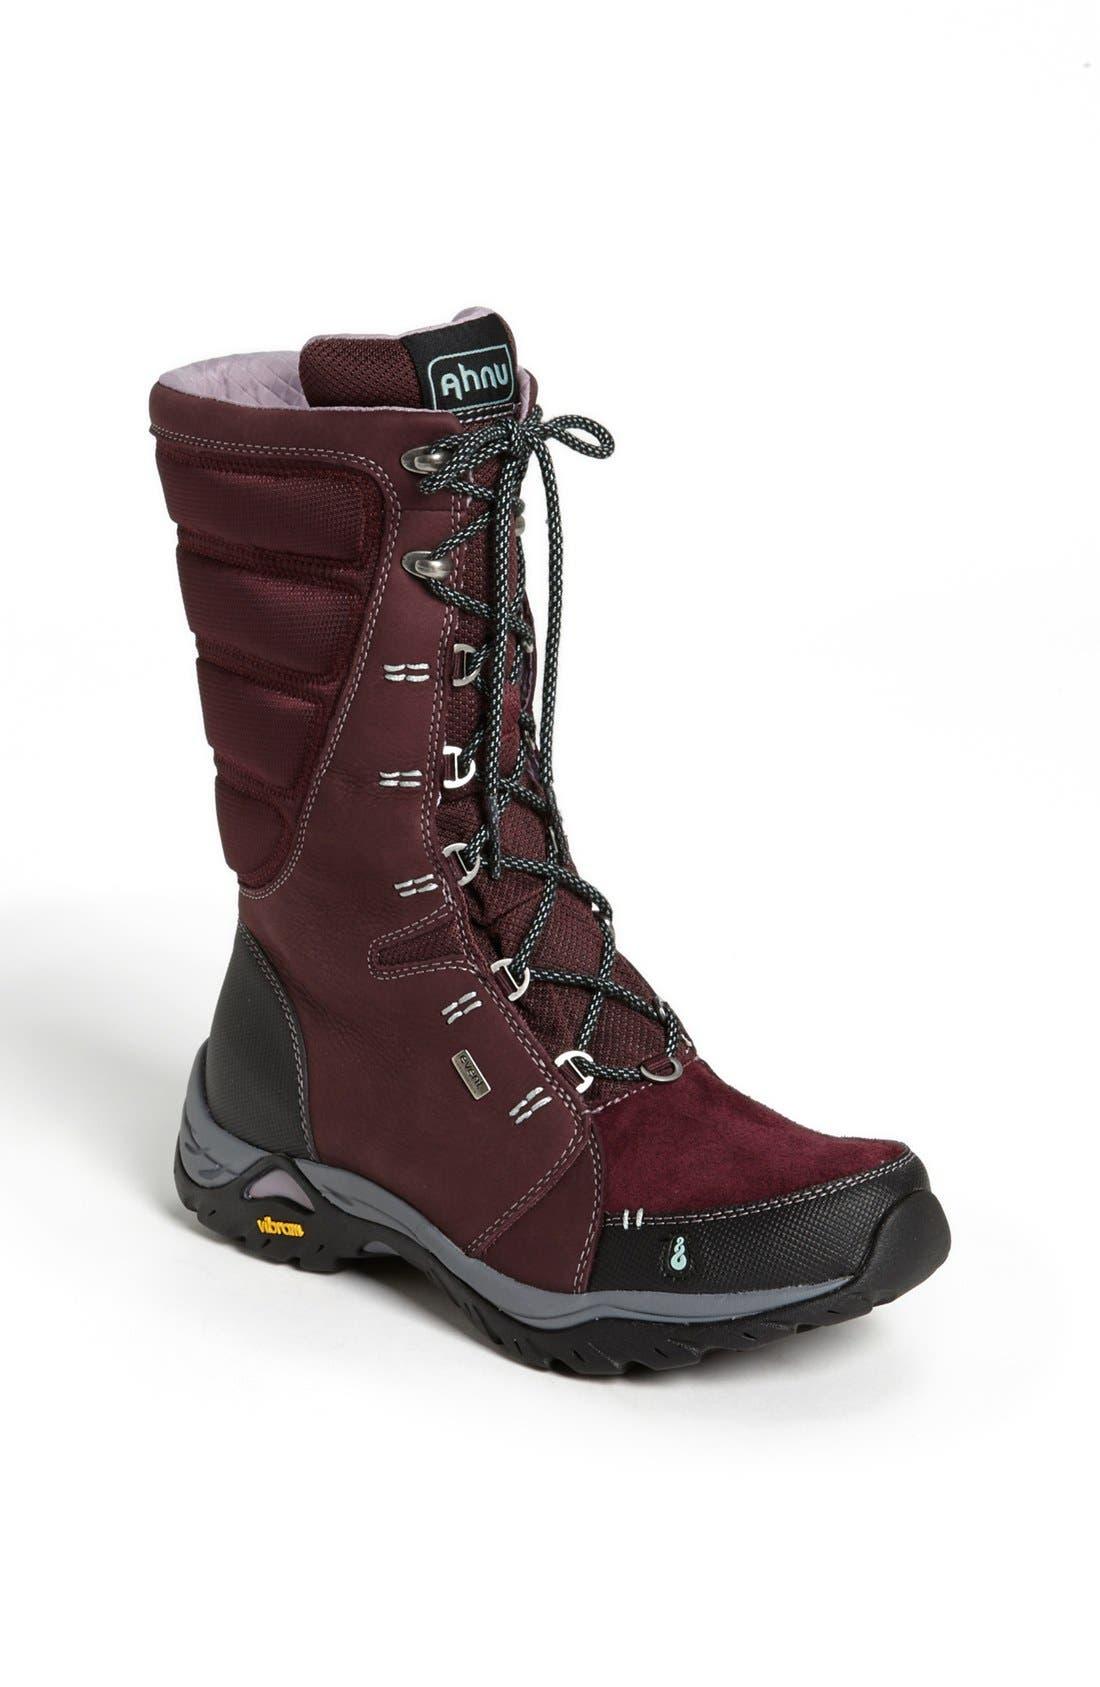 Alternate Image 1 Selected - Ahnu 'Northridge' Boot